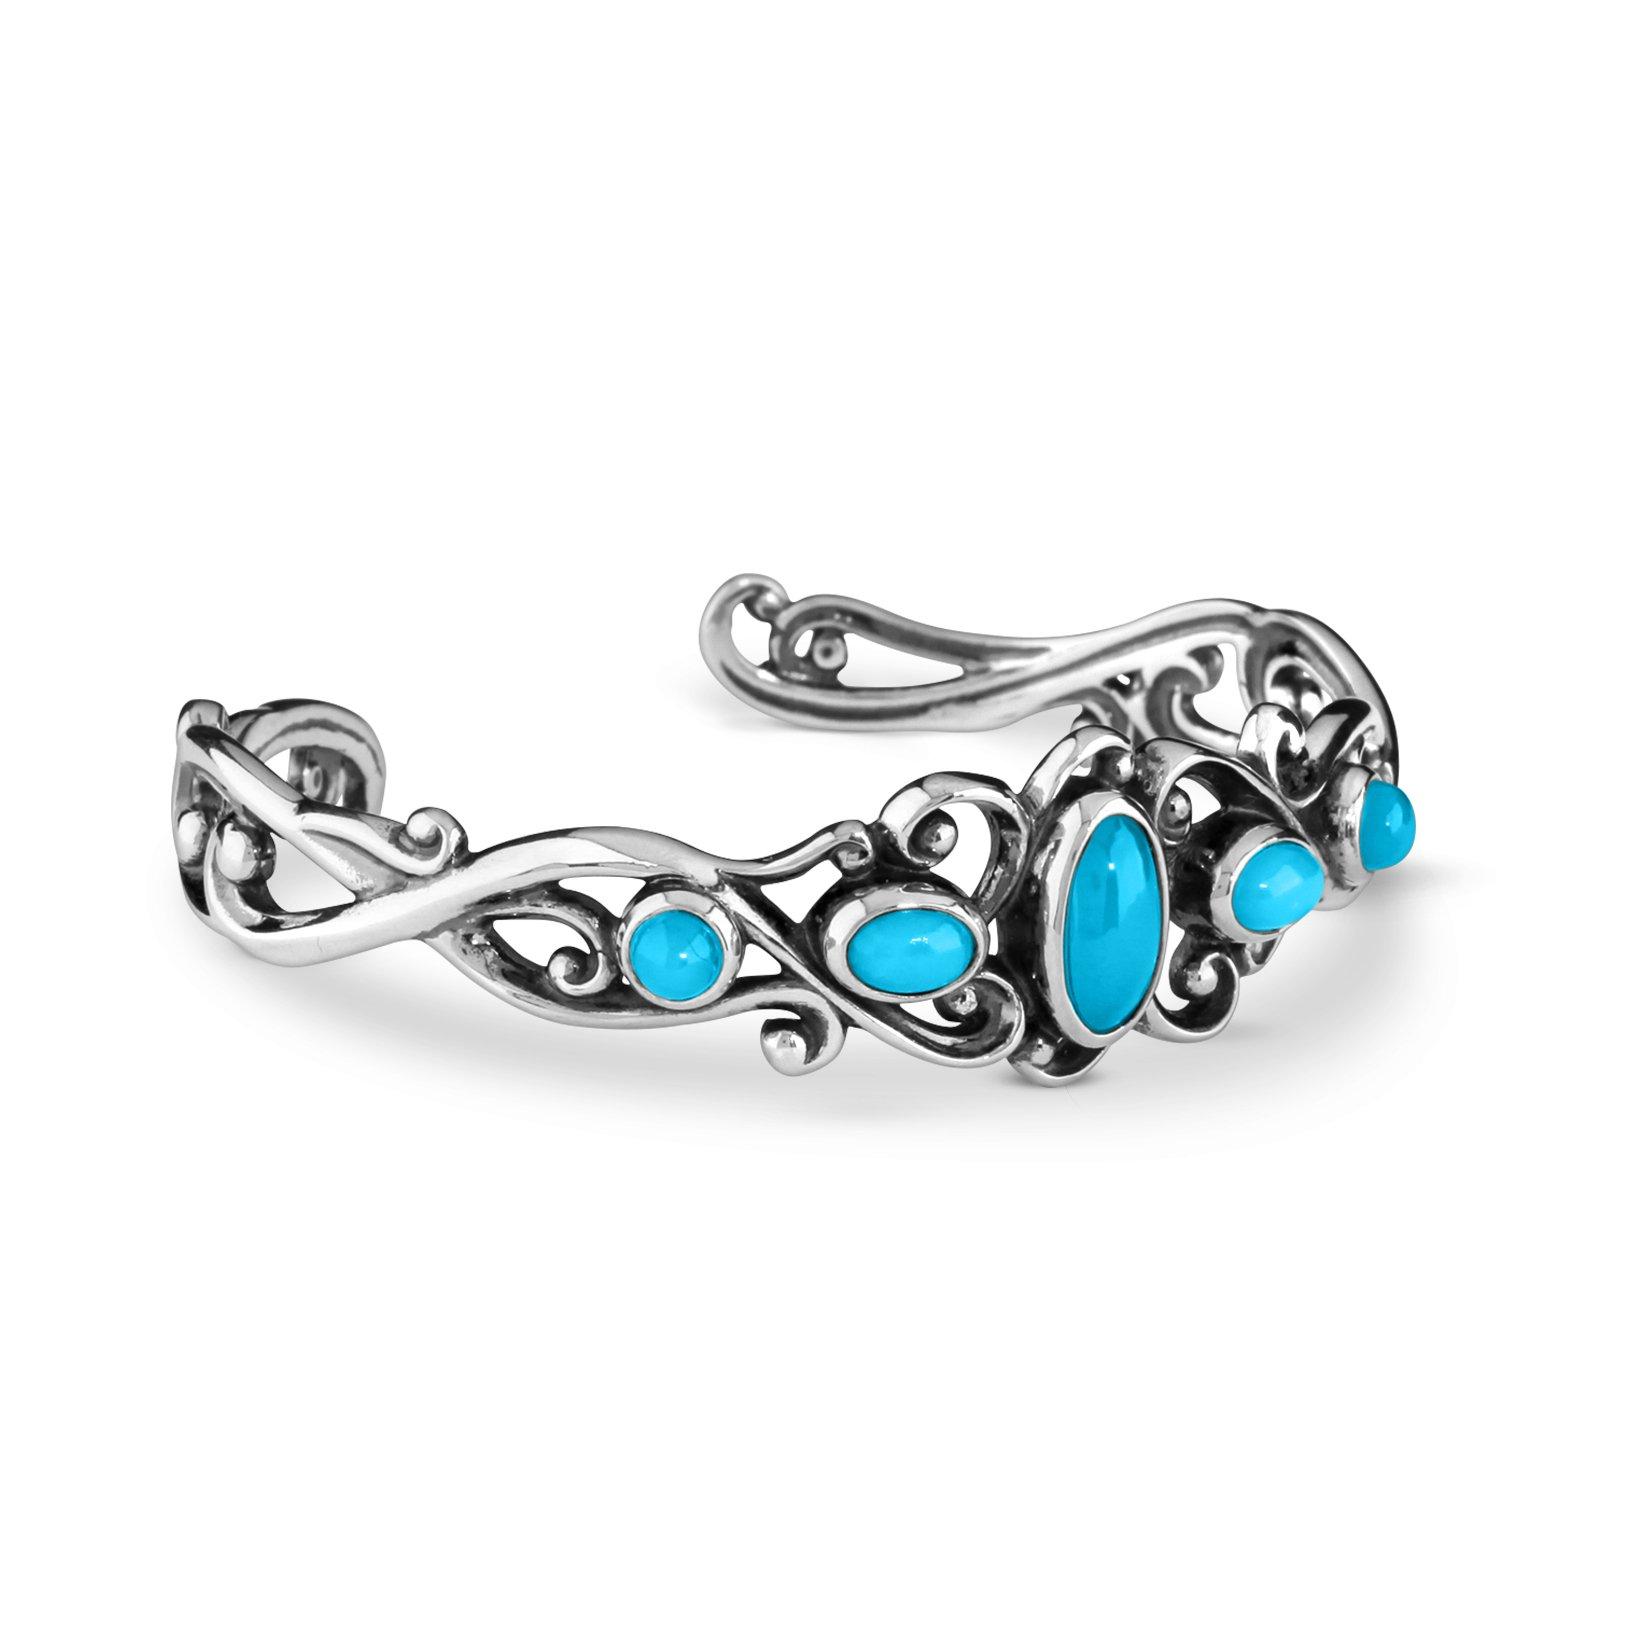 Carolyn Pollack Sleeping Beauty Turquoise Cuff Bracelet